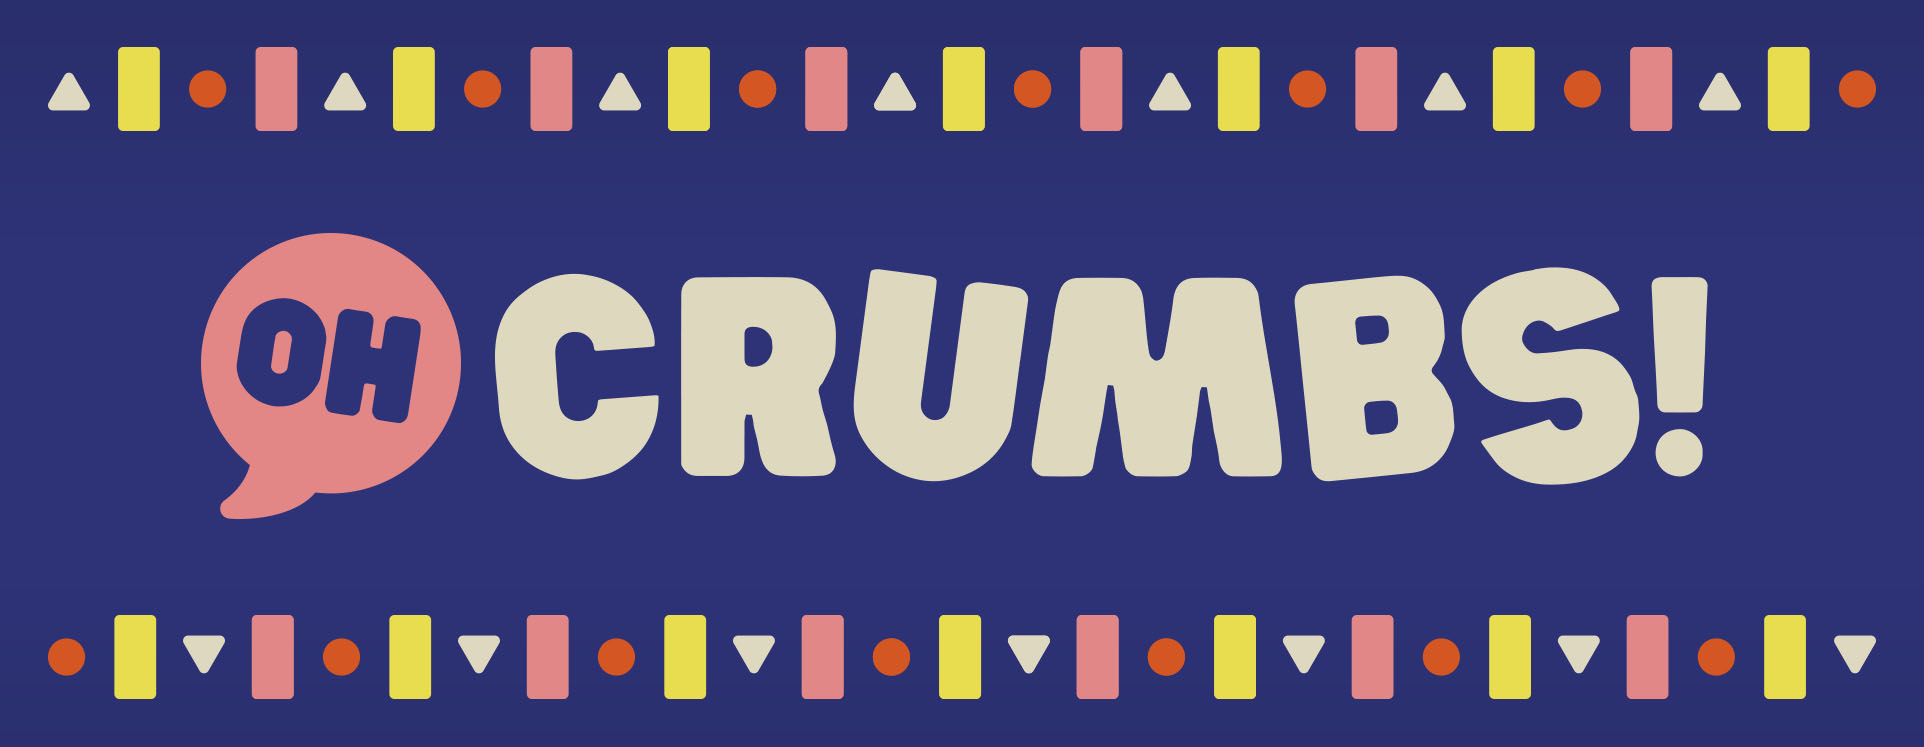 Oh_Crumbs_Title_1.1.jpg